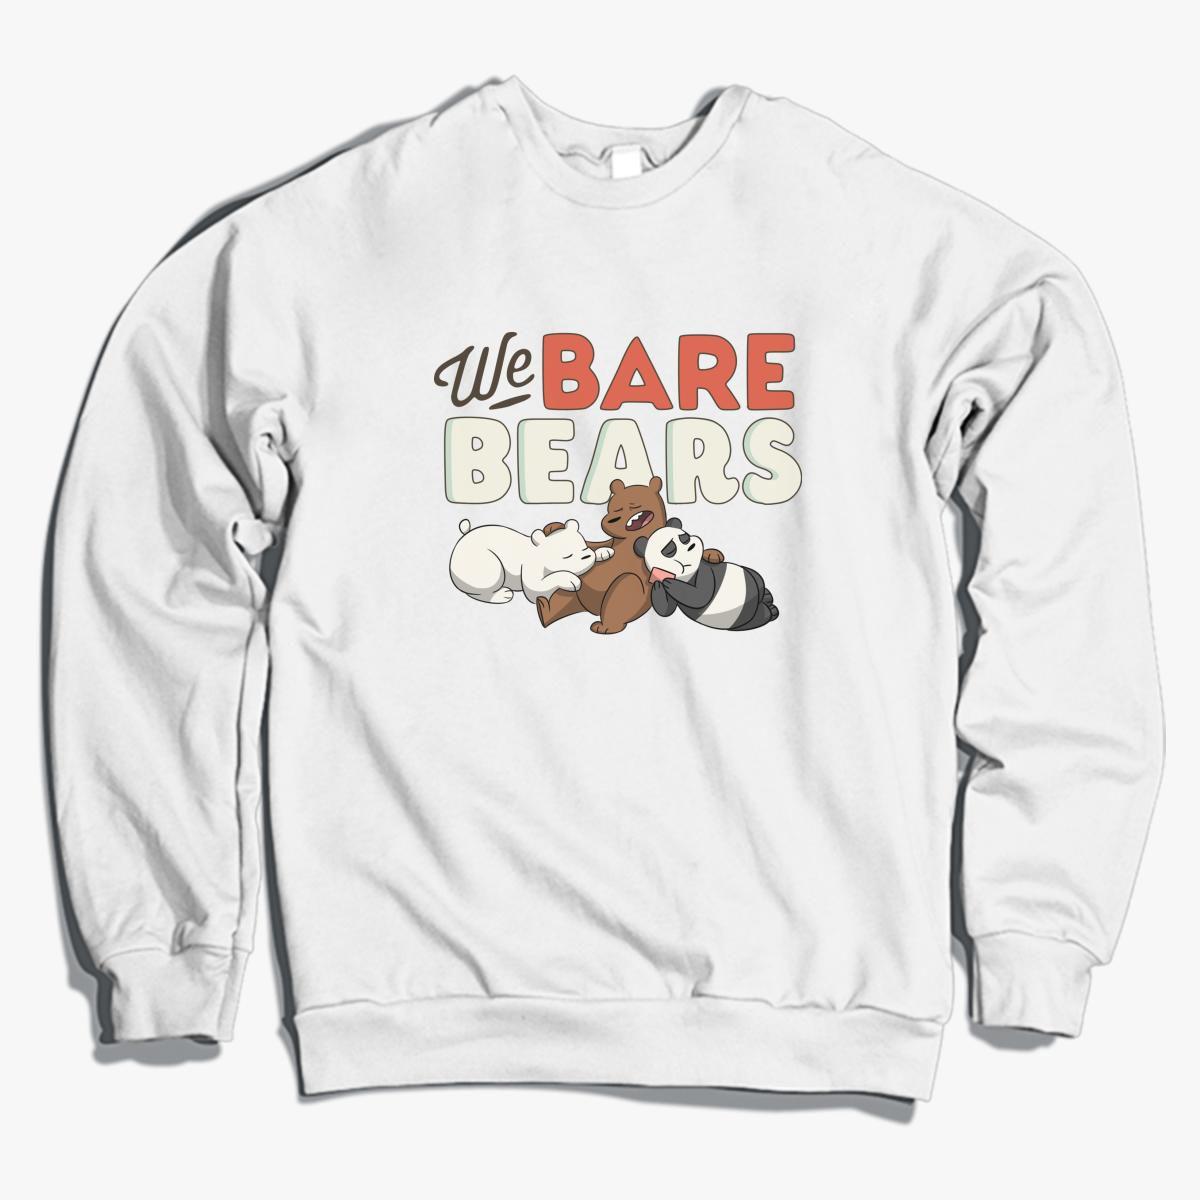 30+ Best Family T-Shirt images   t shirt, mens tops, shirts